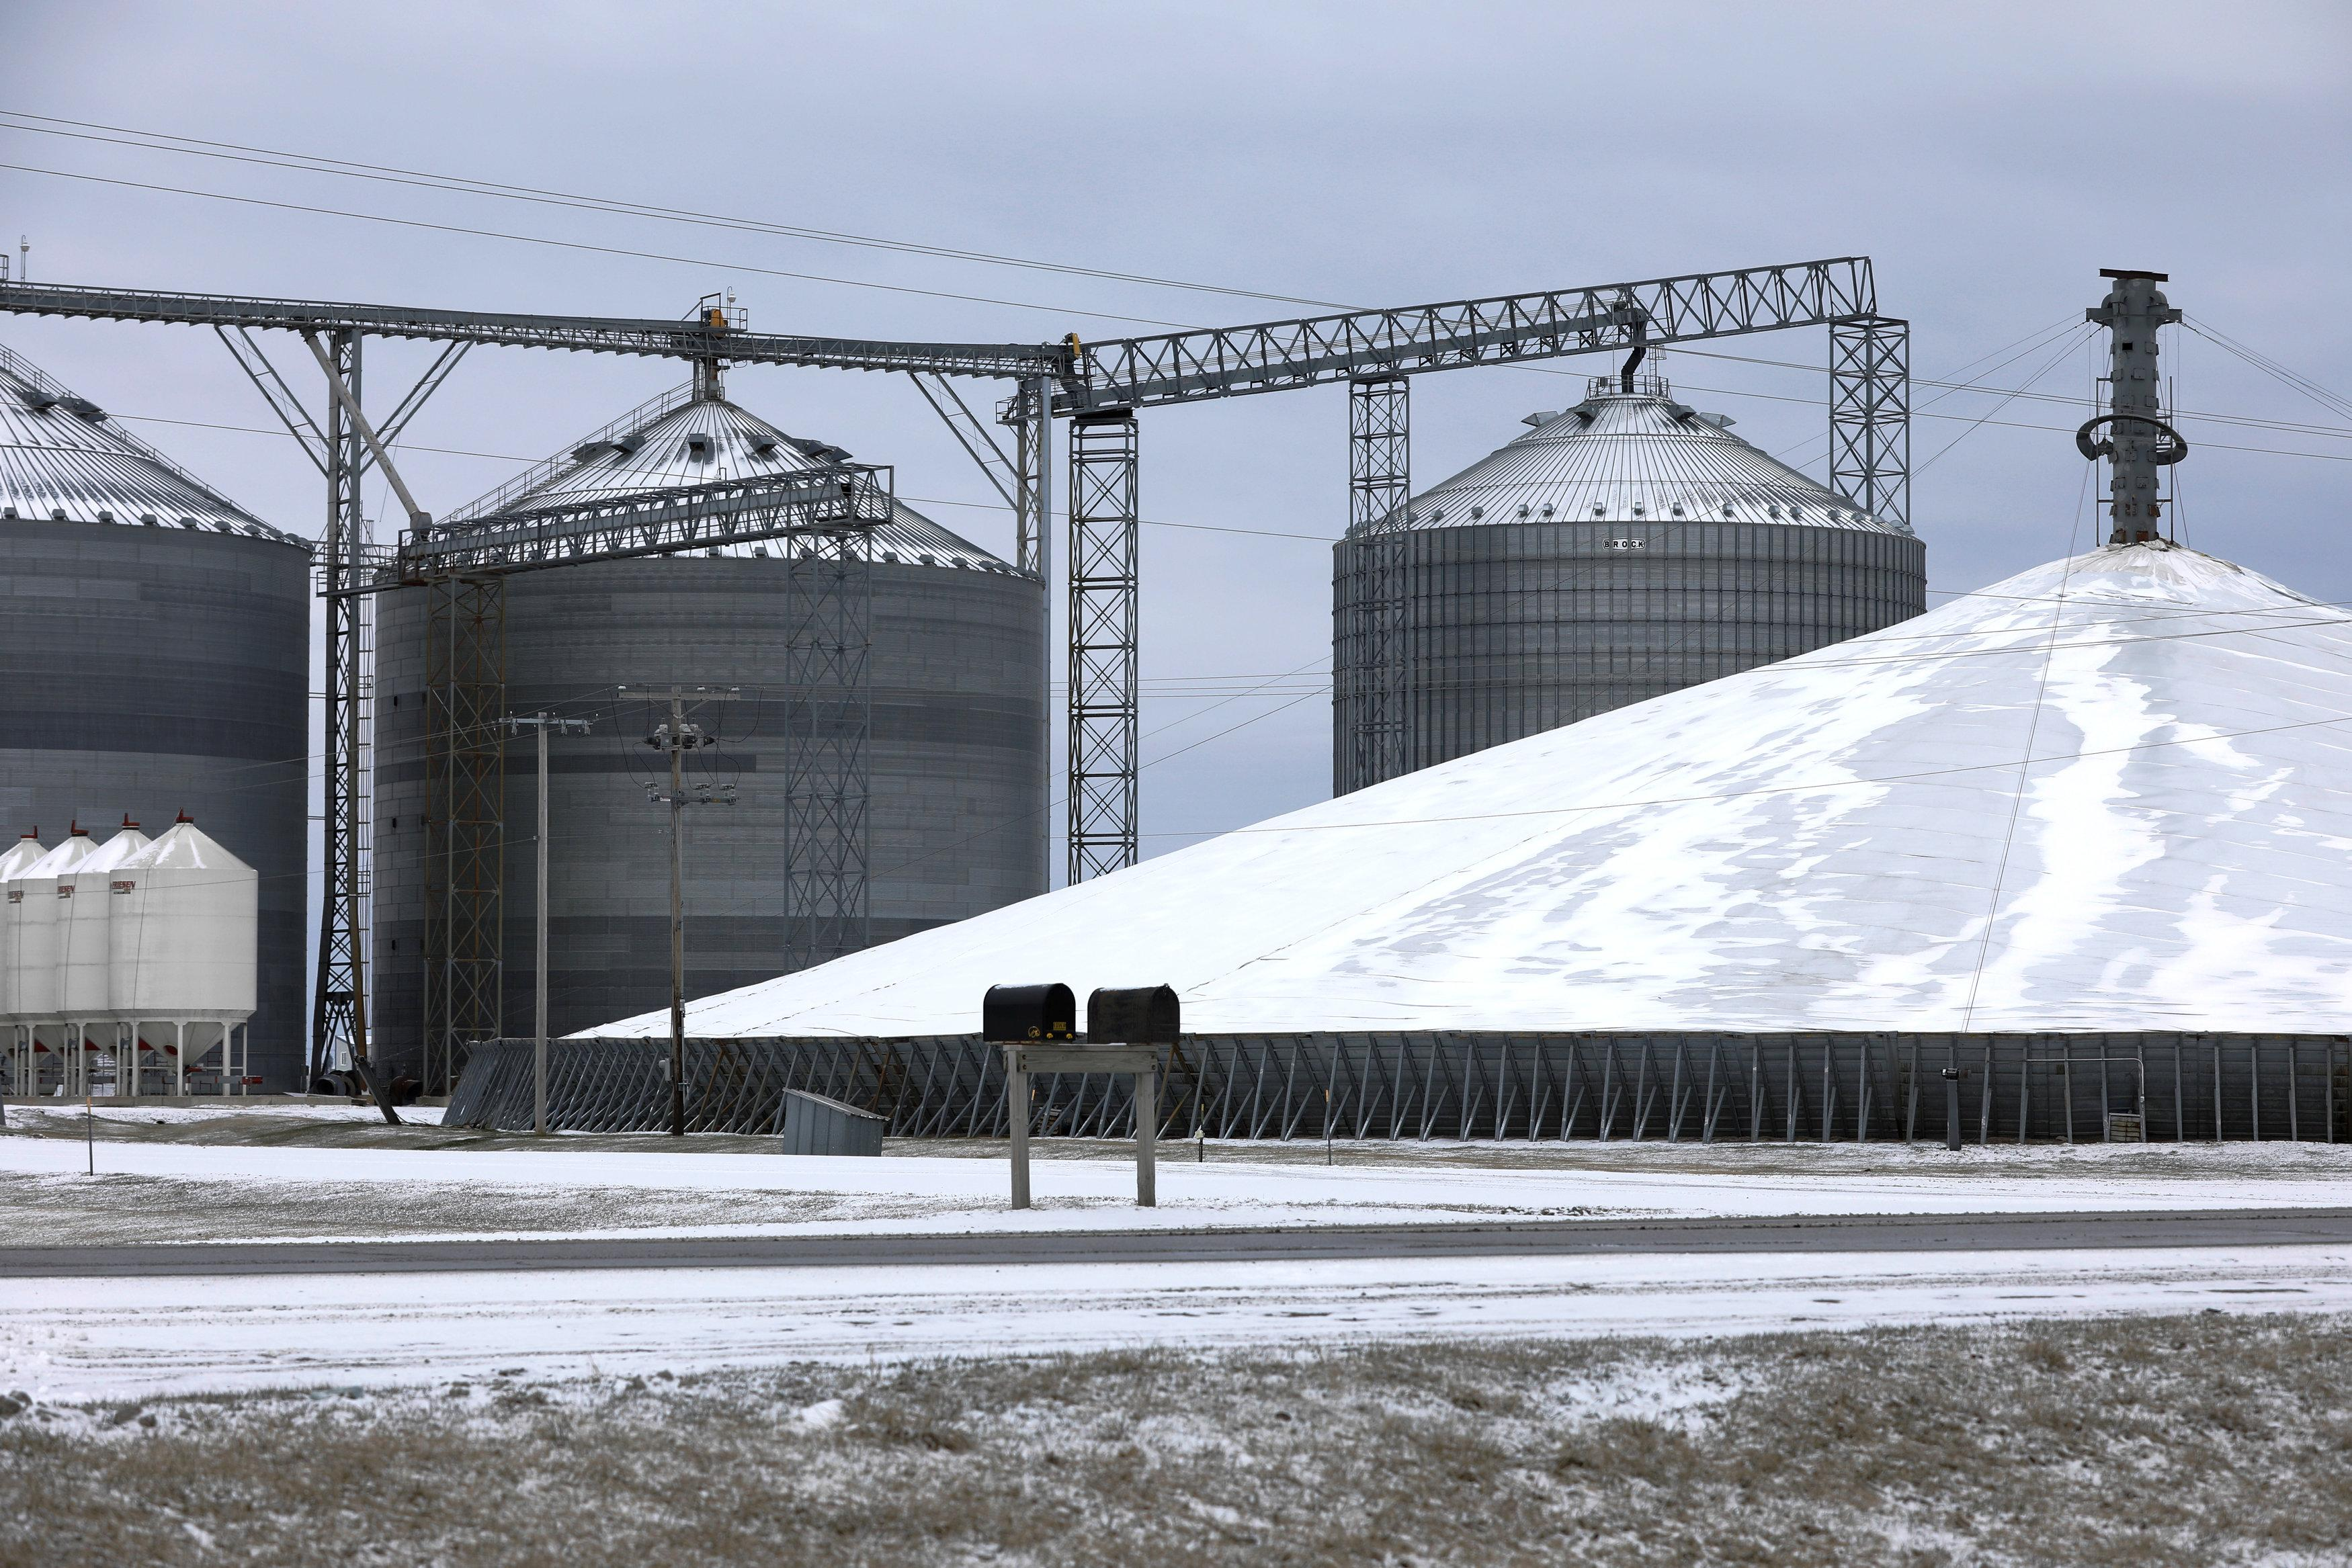 Grains piled on runways, parking lots, fields amid global glut - Reuters